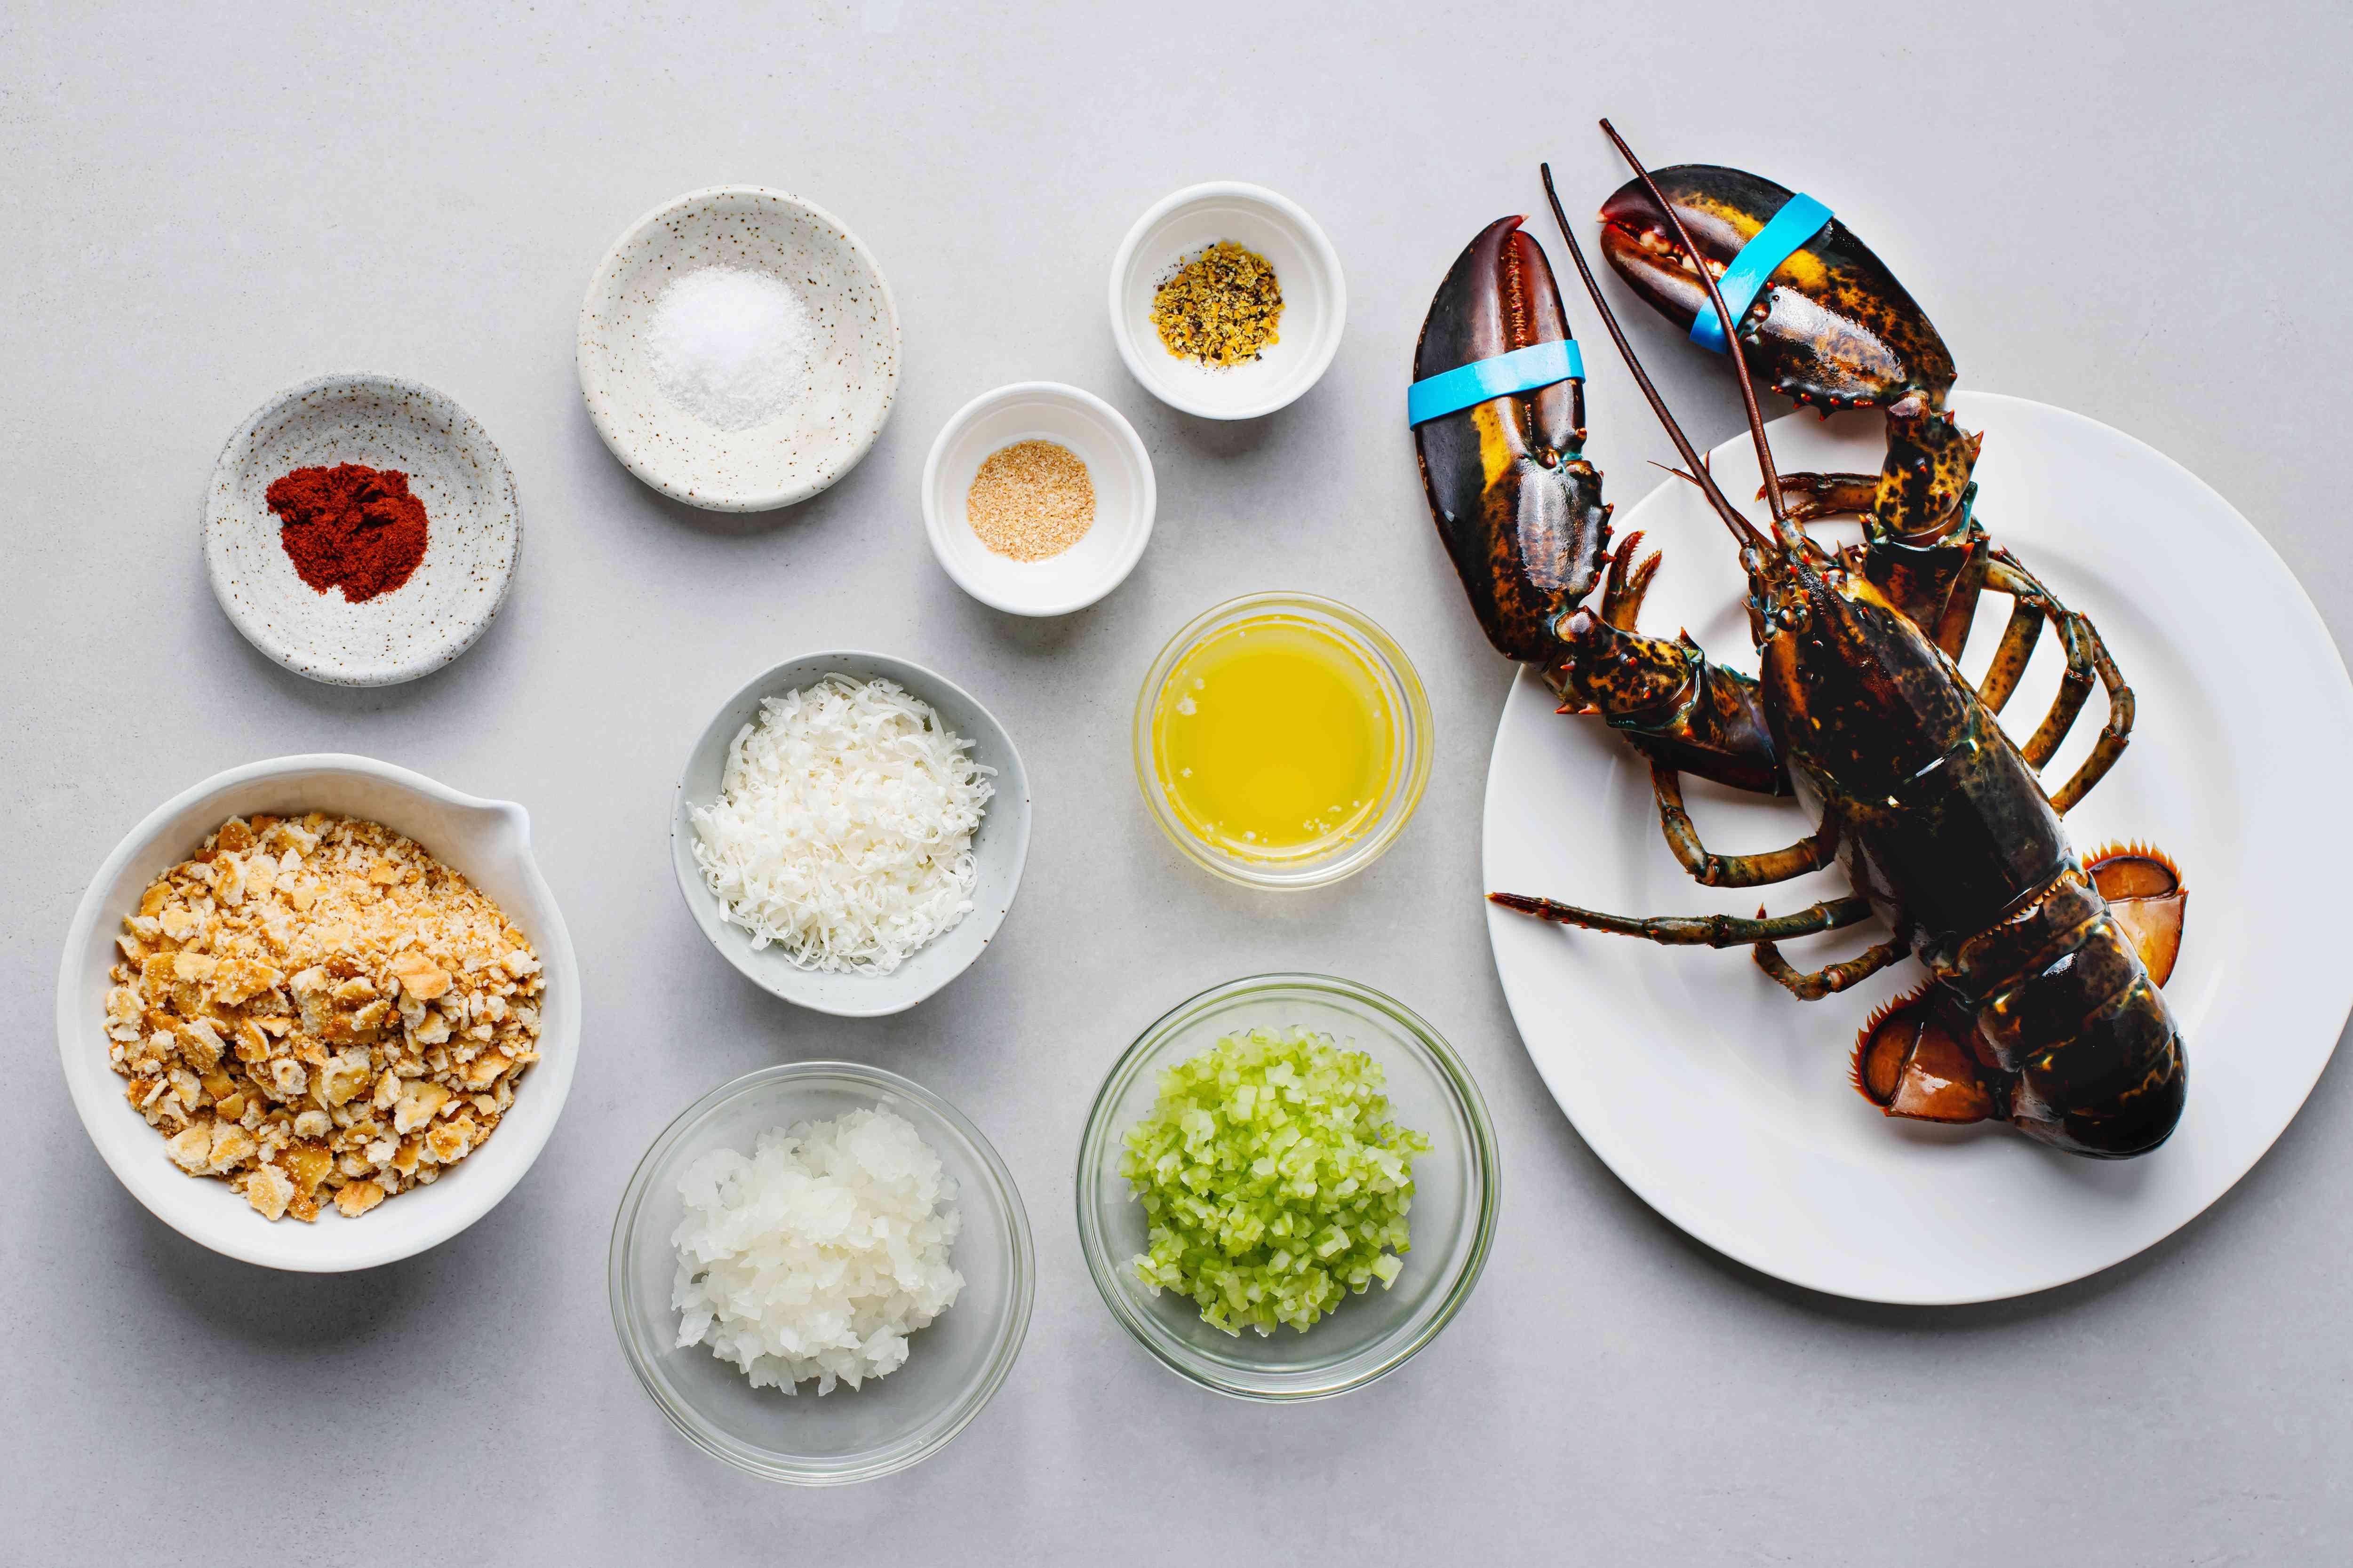 Easy and Elegant Baked Stuffed Lobster ingredients